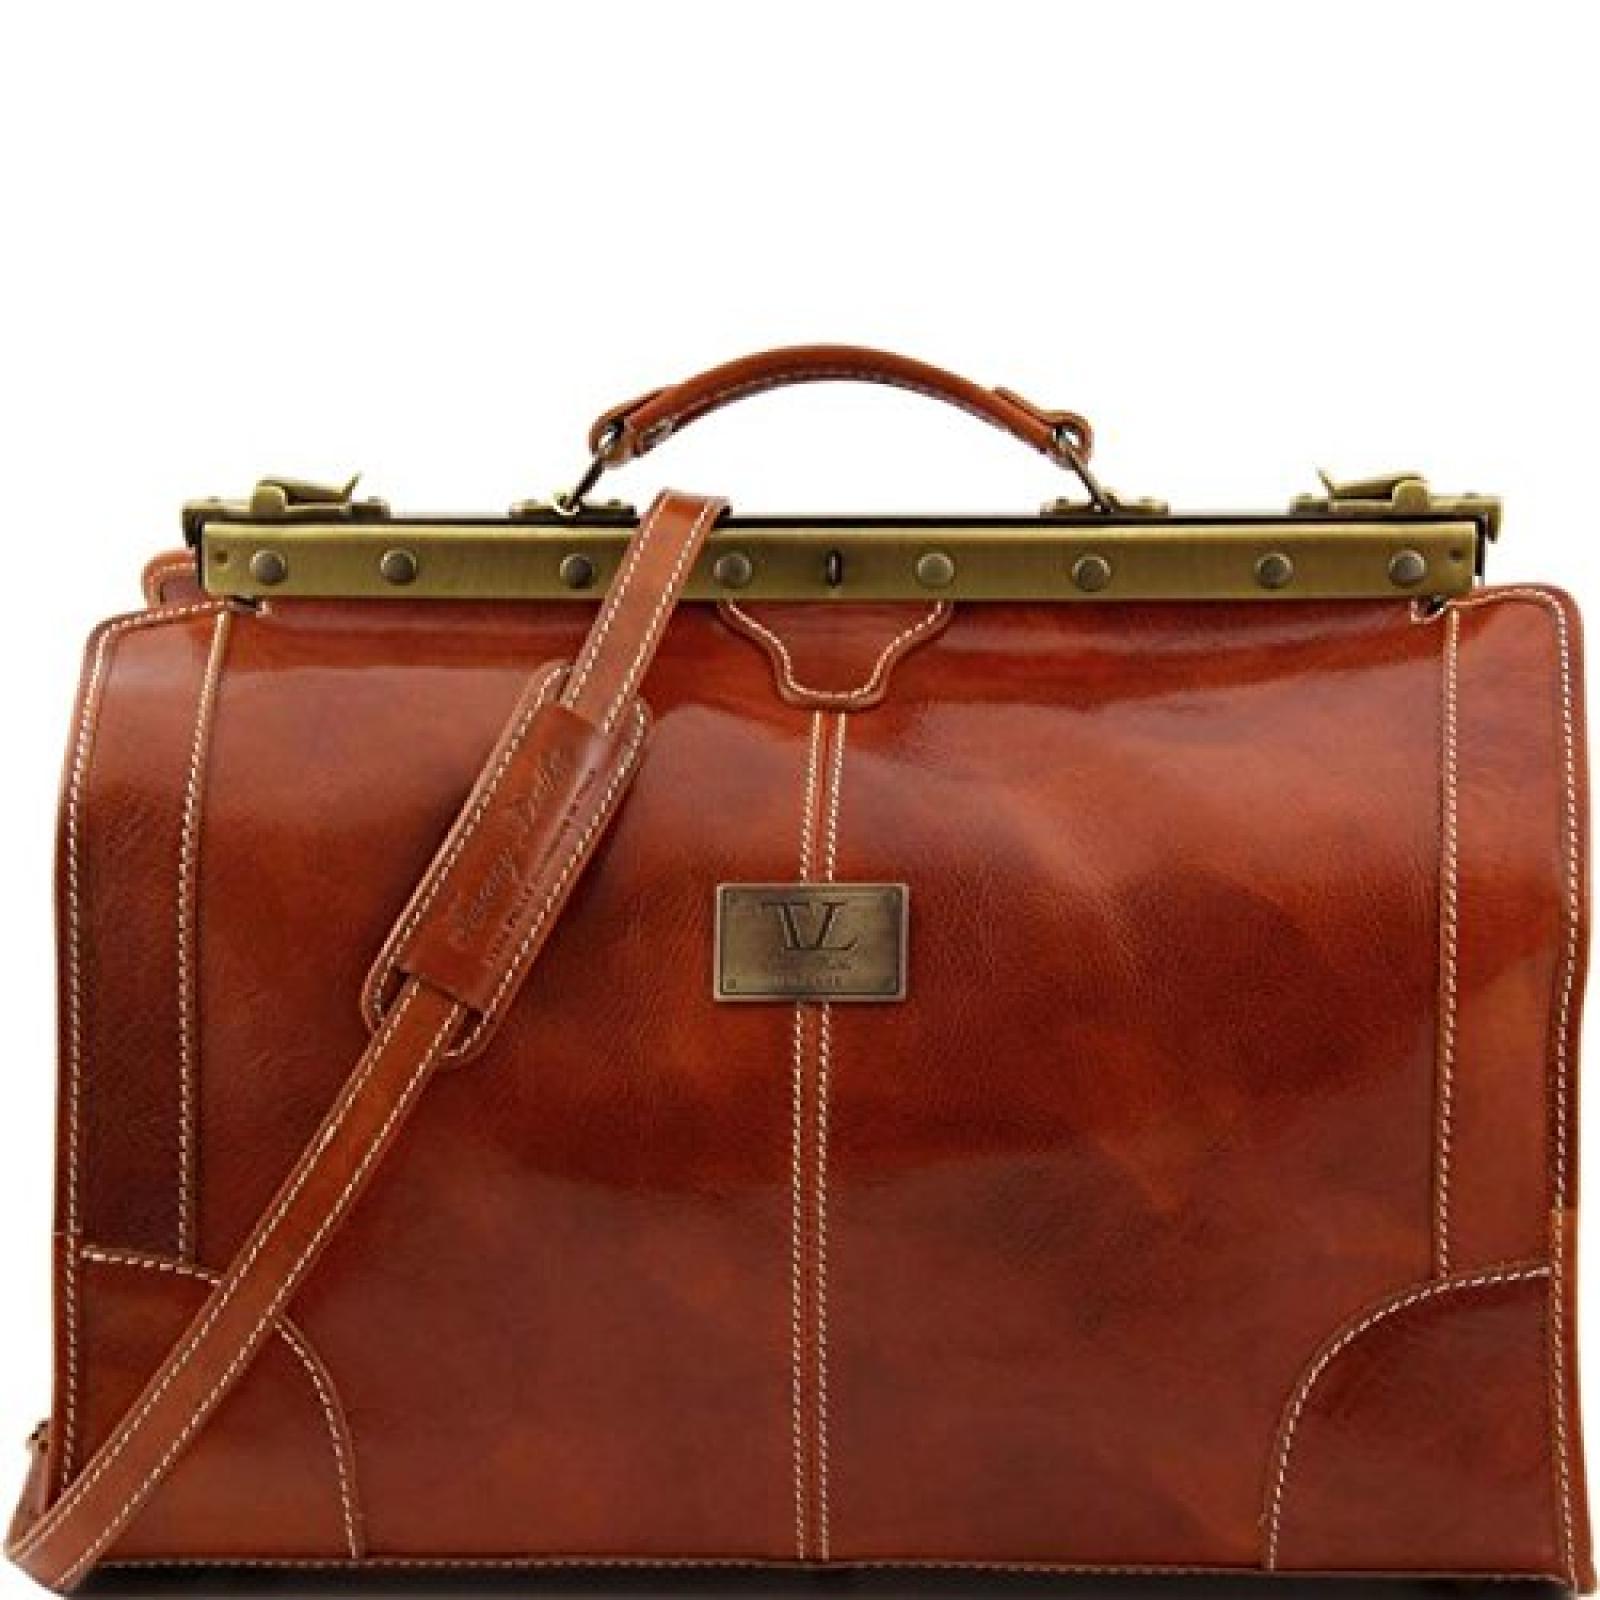 Tuscany Leather - Madrid - Maulbügelreisetasche aus Leder - Klein Honig - TL1023/3